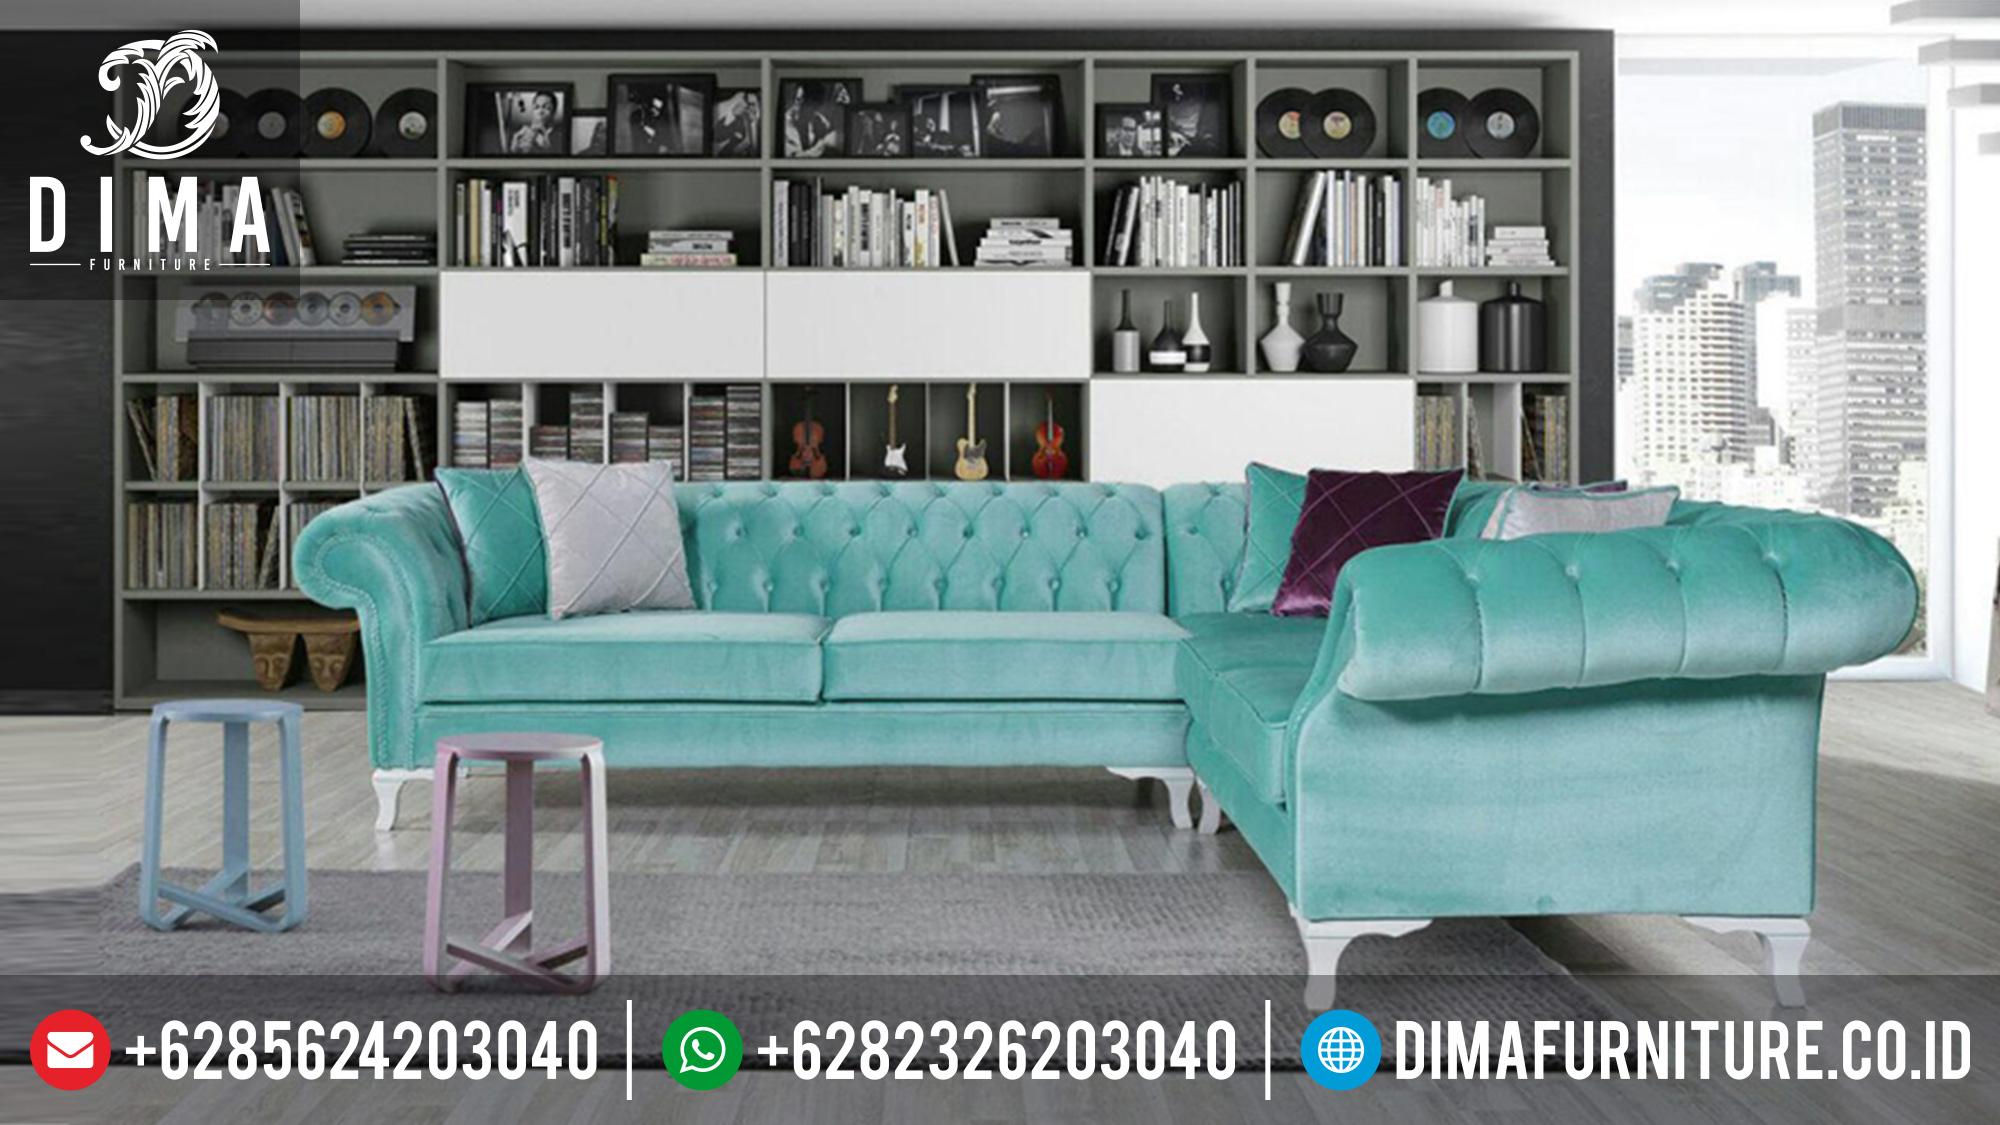 Kursi Sofa Tamu Sudut L Minimalis Mewah Terbaru DF-0341 Gambar 1